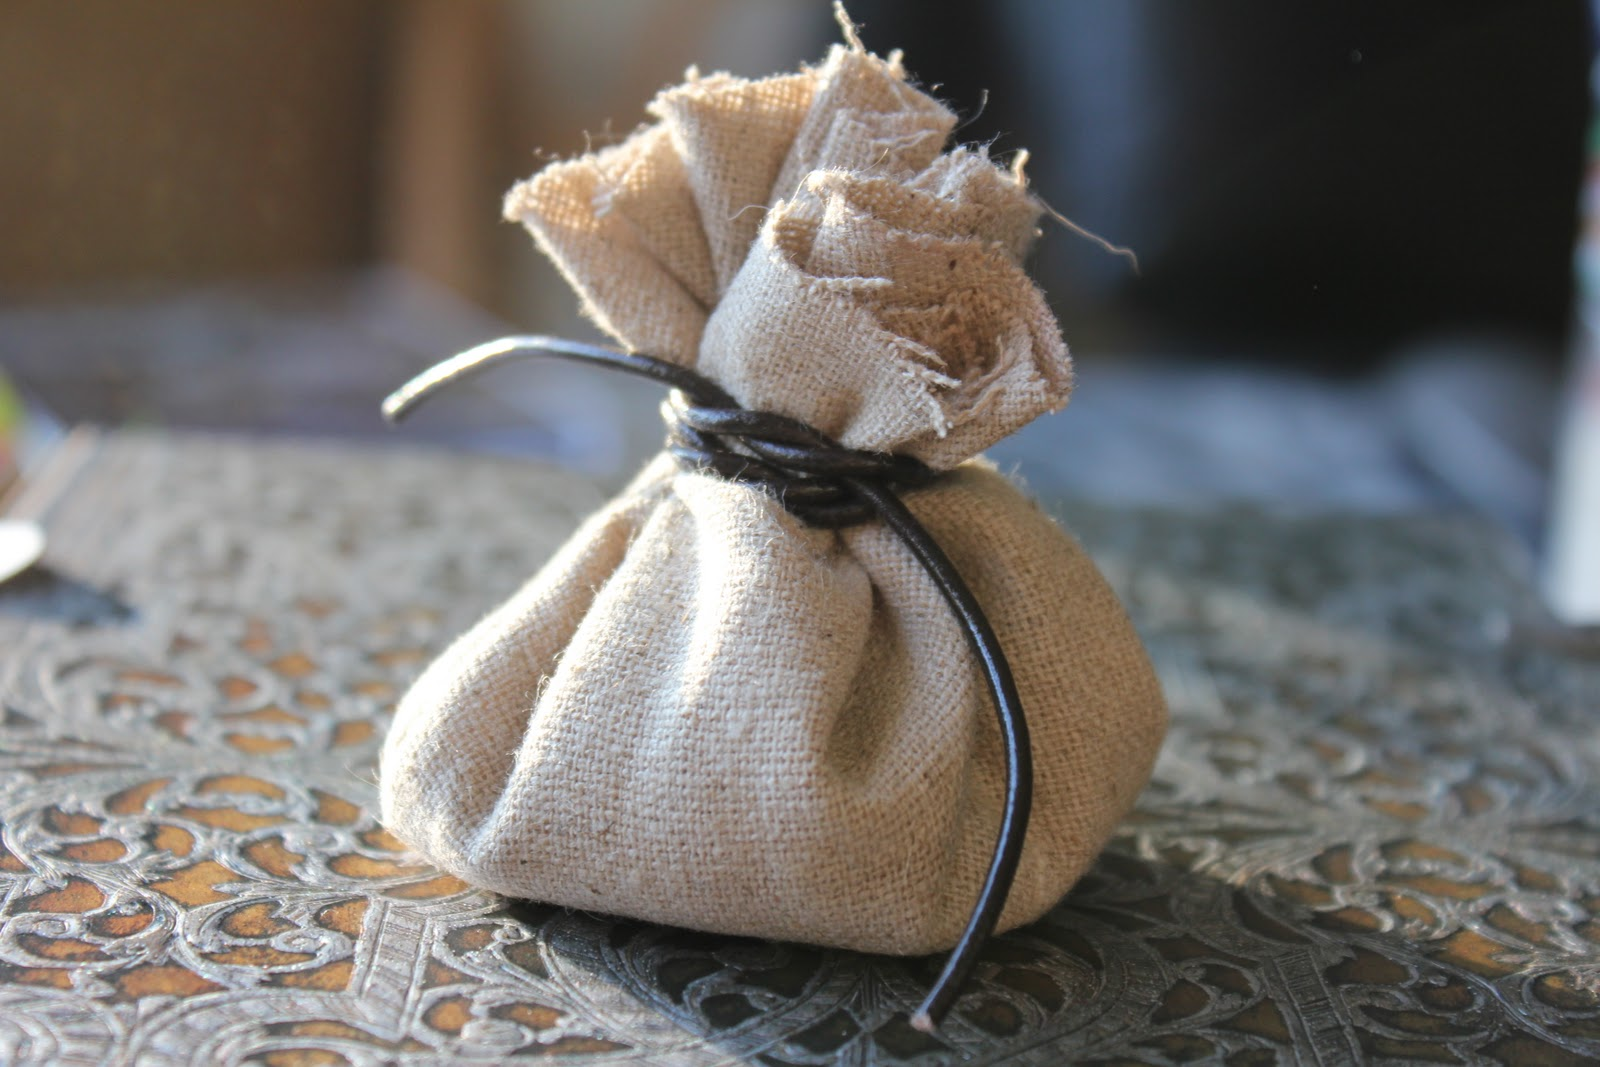 Medieval Bride: Easy DIY favor bags / rice bags